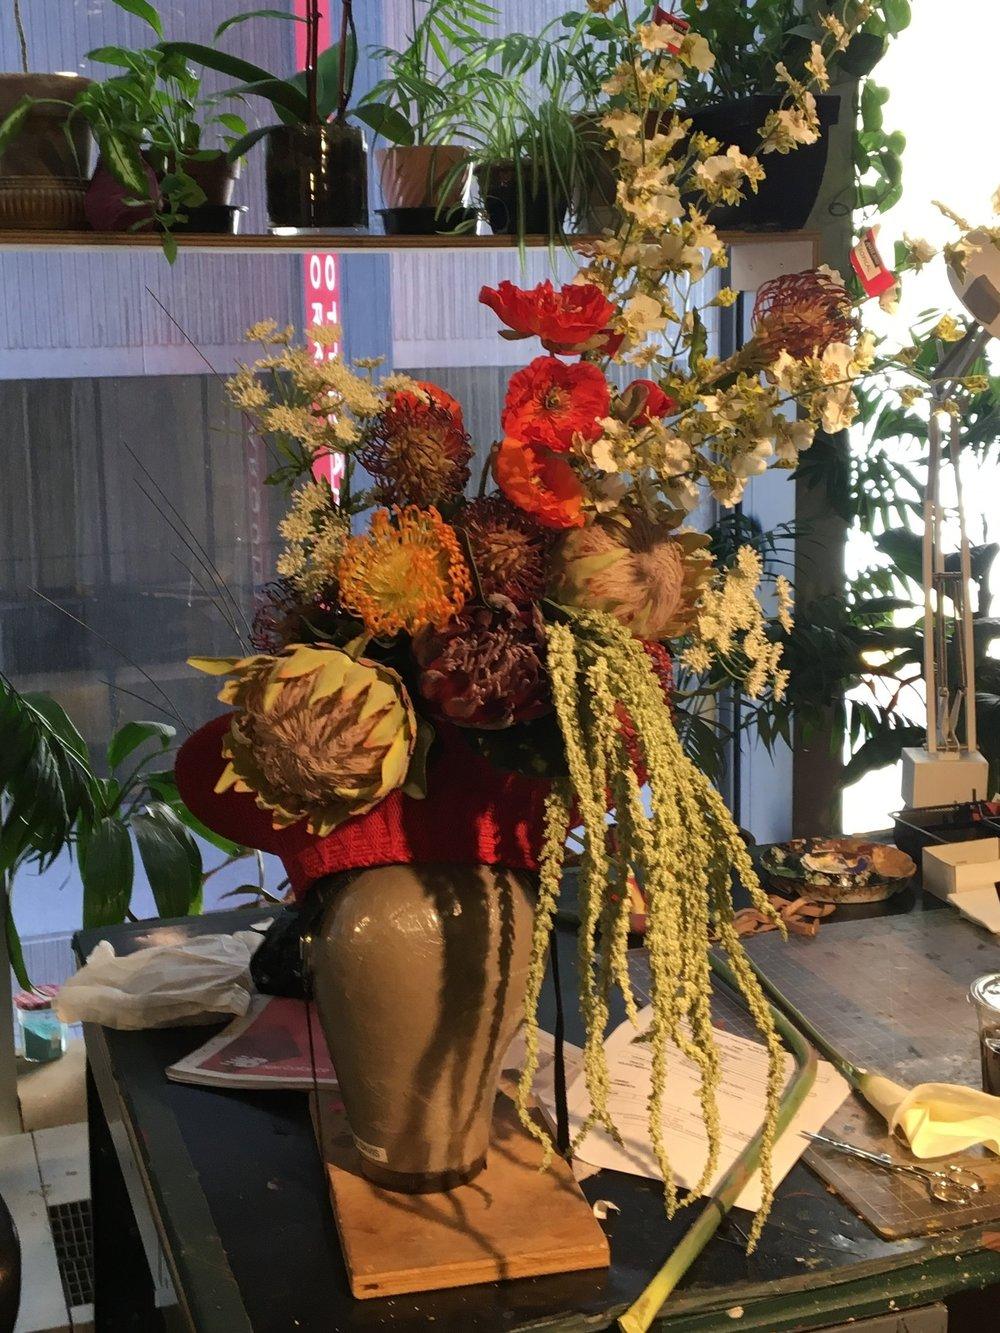 FLOWERS BONNET - 2016